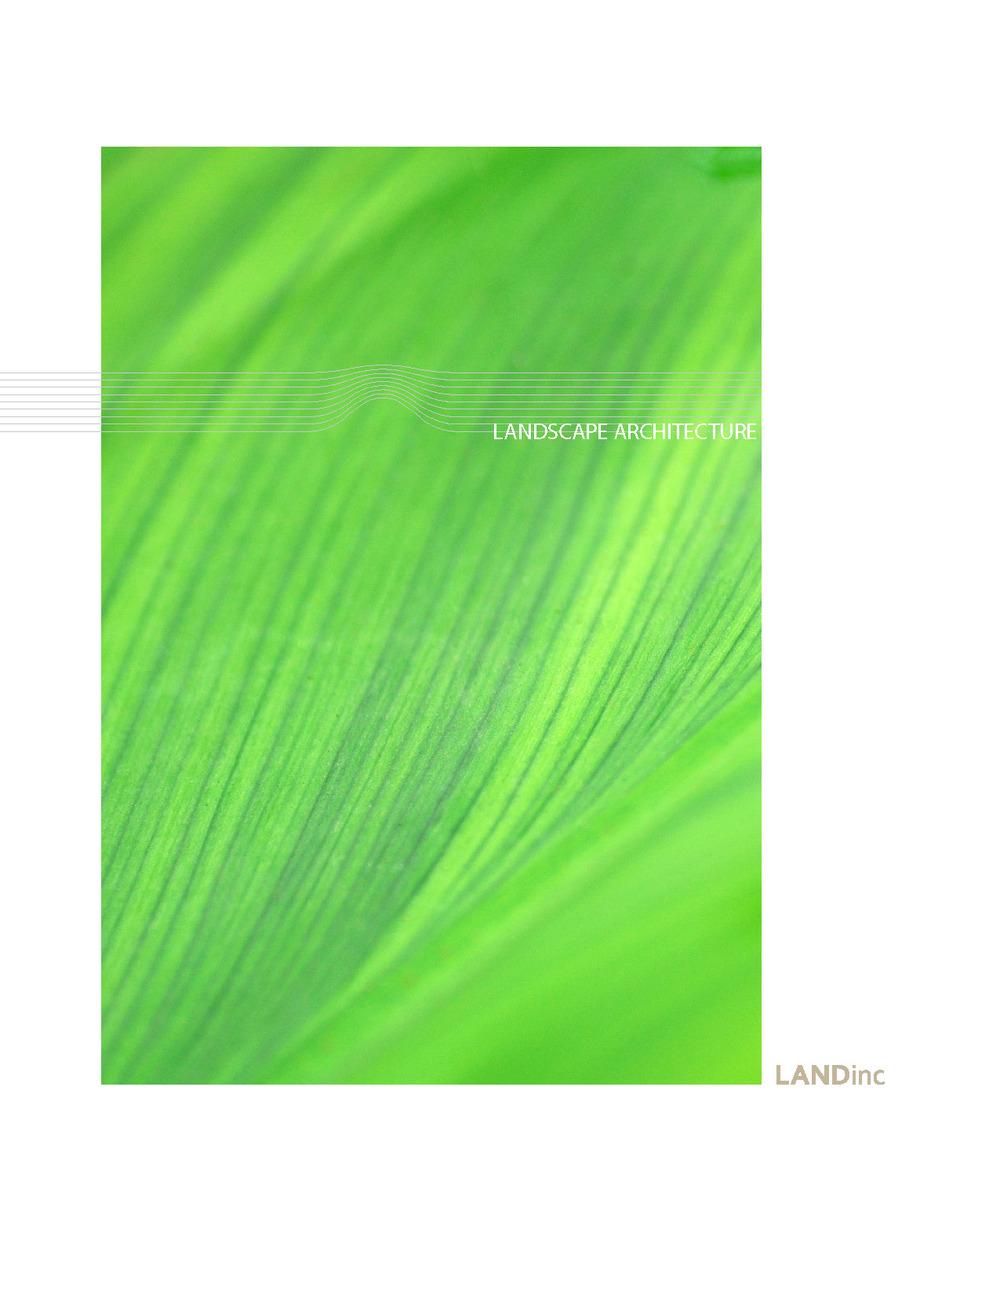 LANDinc_All_Page_006.jpg